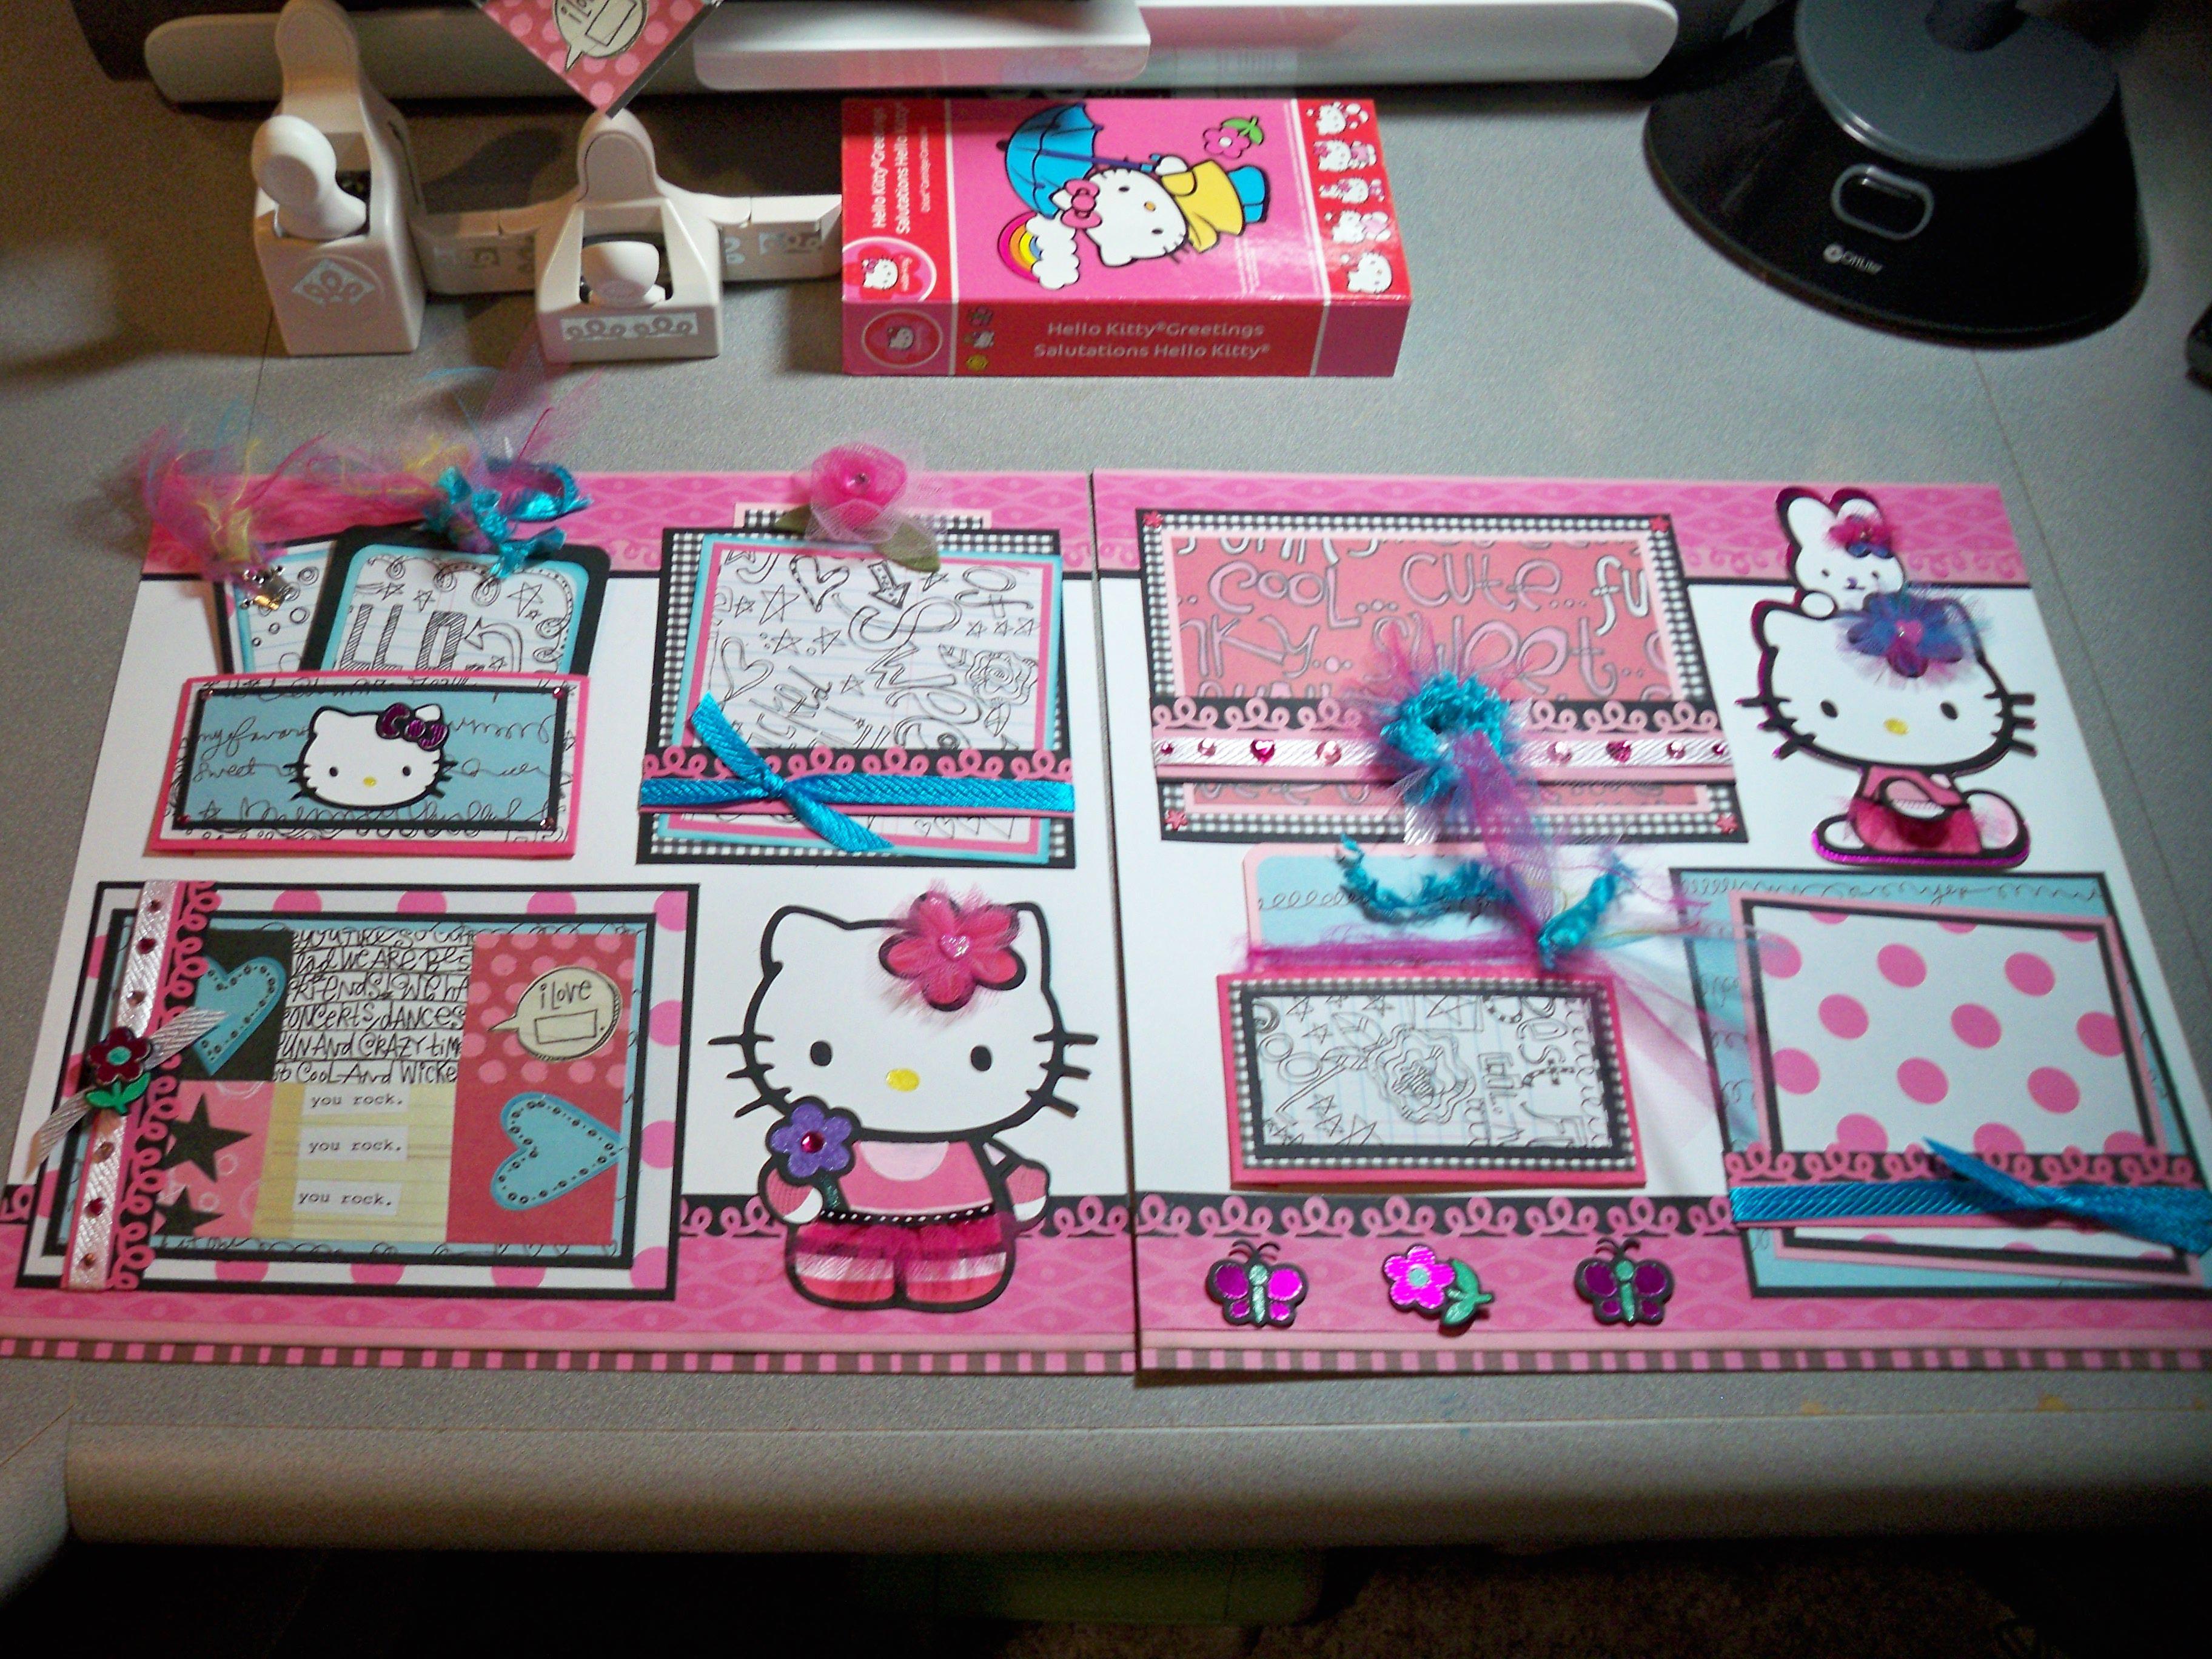 Scrapbook ideas hello kitty - Hello Kitty Scarupbook Cricut Weekly Challenge I Want To Scrapbook